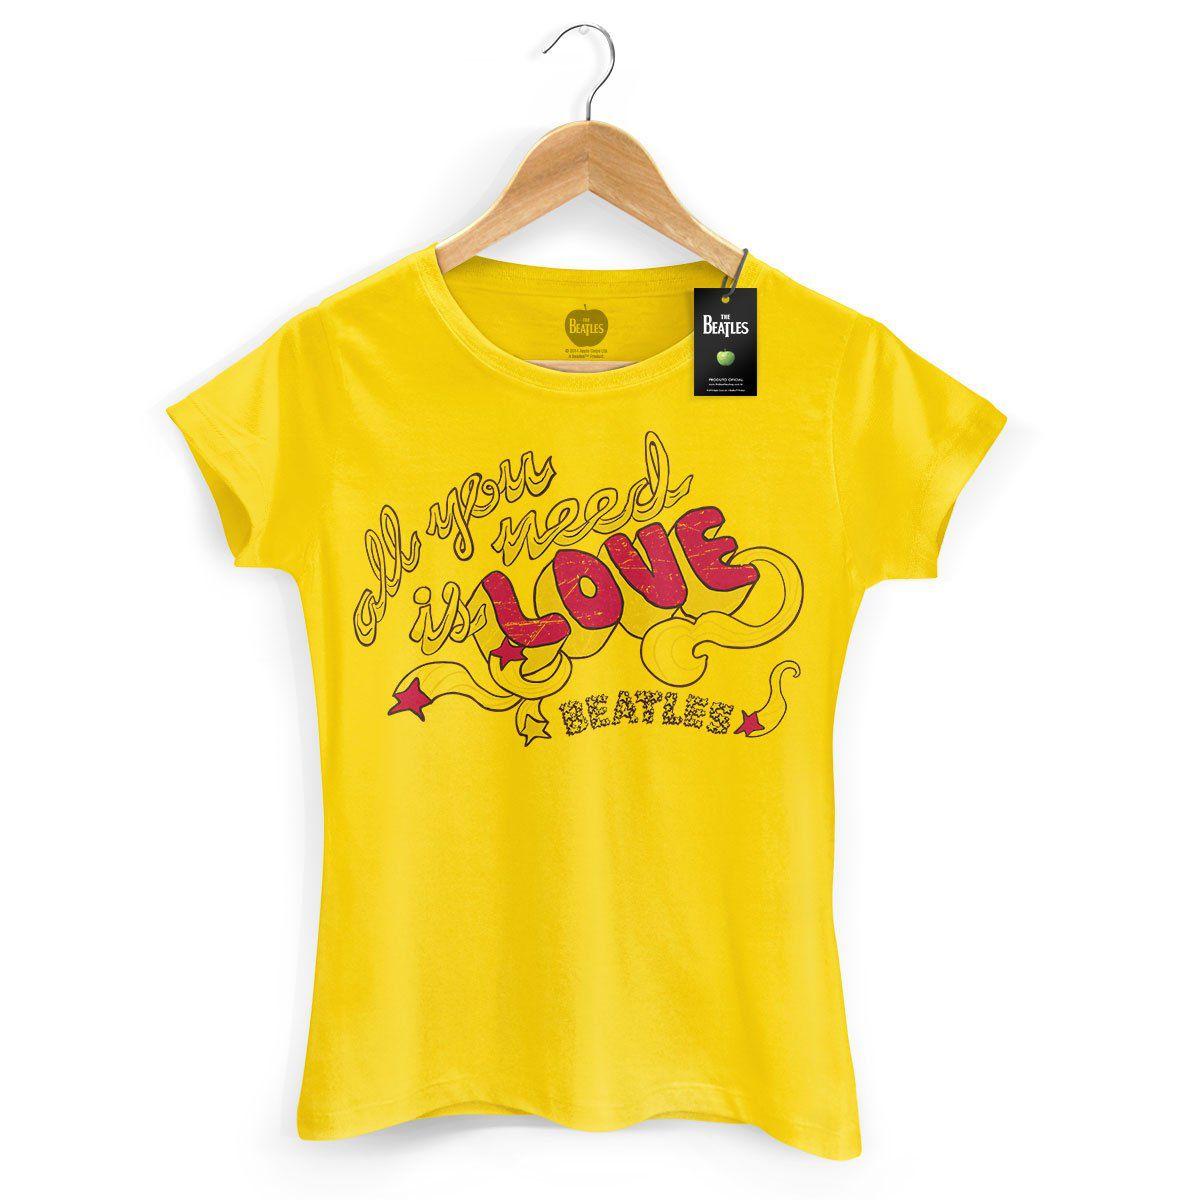 Camiseta Feminina The Beatles All You Need Is Love  - bandUP Store Marketplace